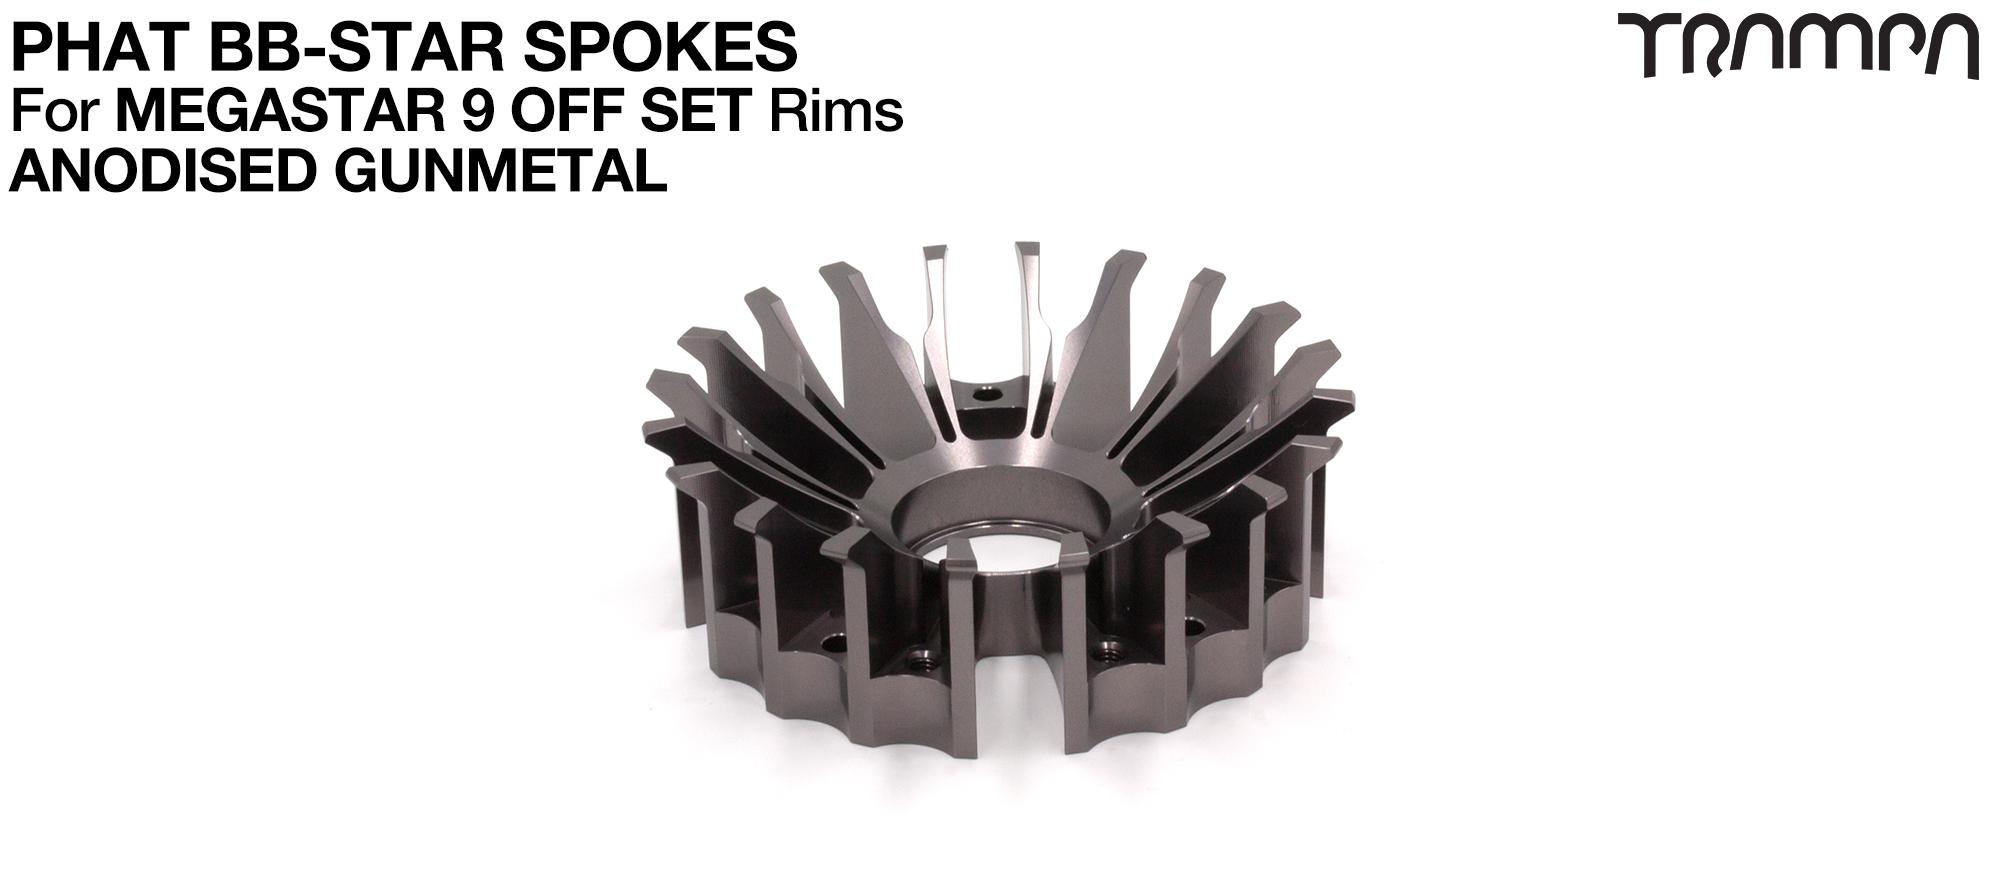 BB Star Spoke for 9 Inch DEEP-DISH MEGASTAR Rim - CNC Precision milled - GUNMETAL